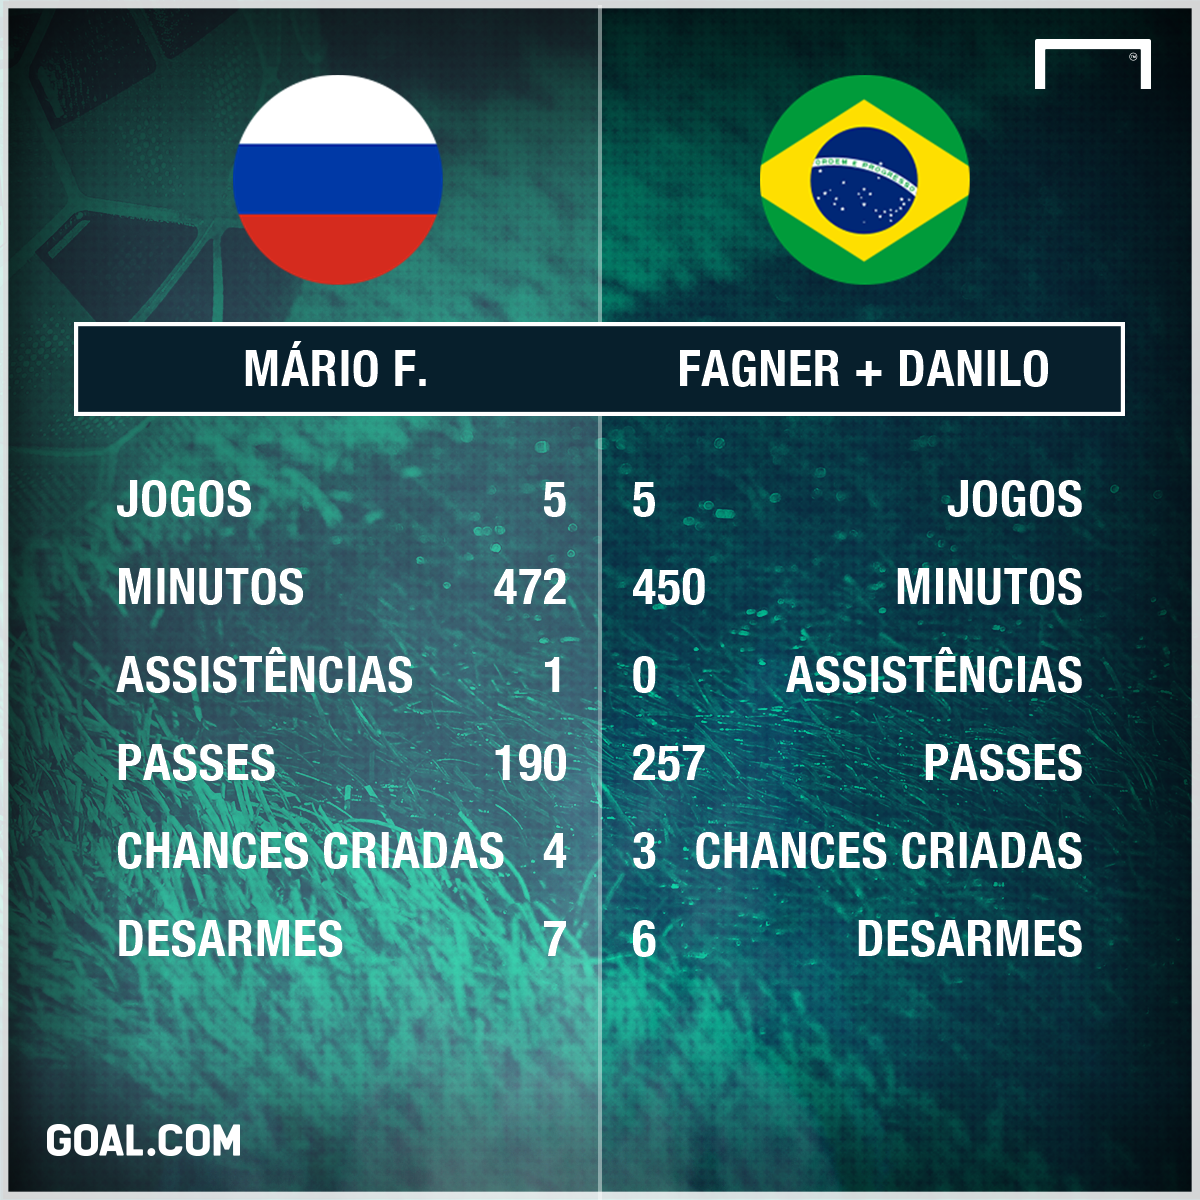 GFX Mario Fernandes Fagner Danilo